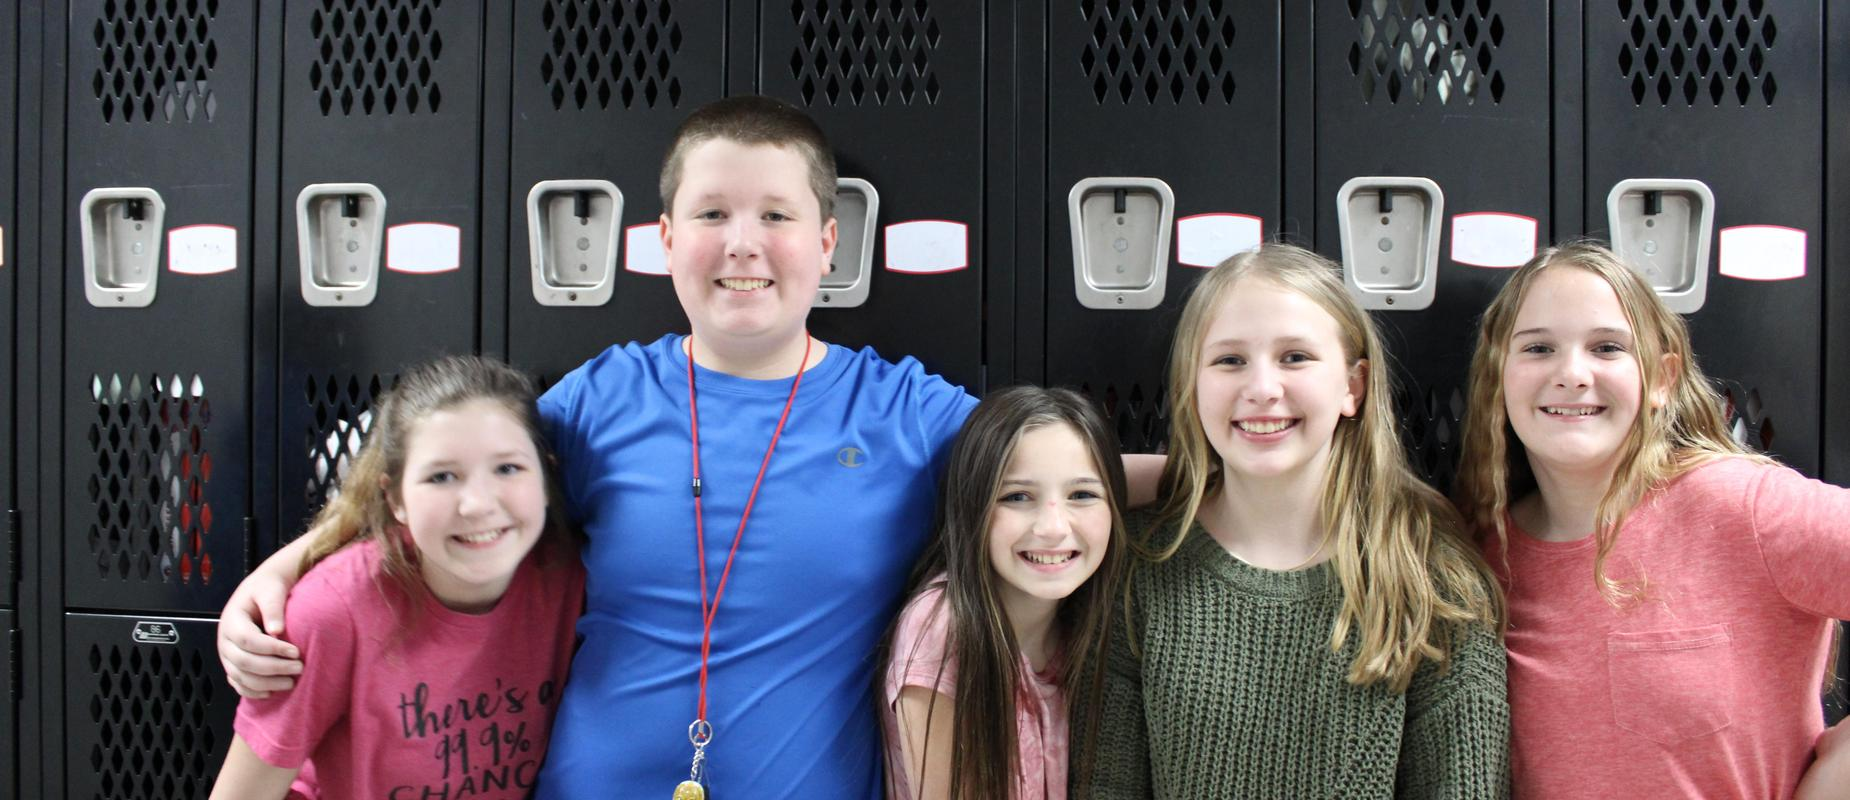 friends in front of lockers